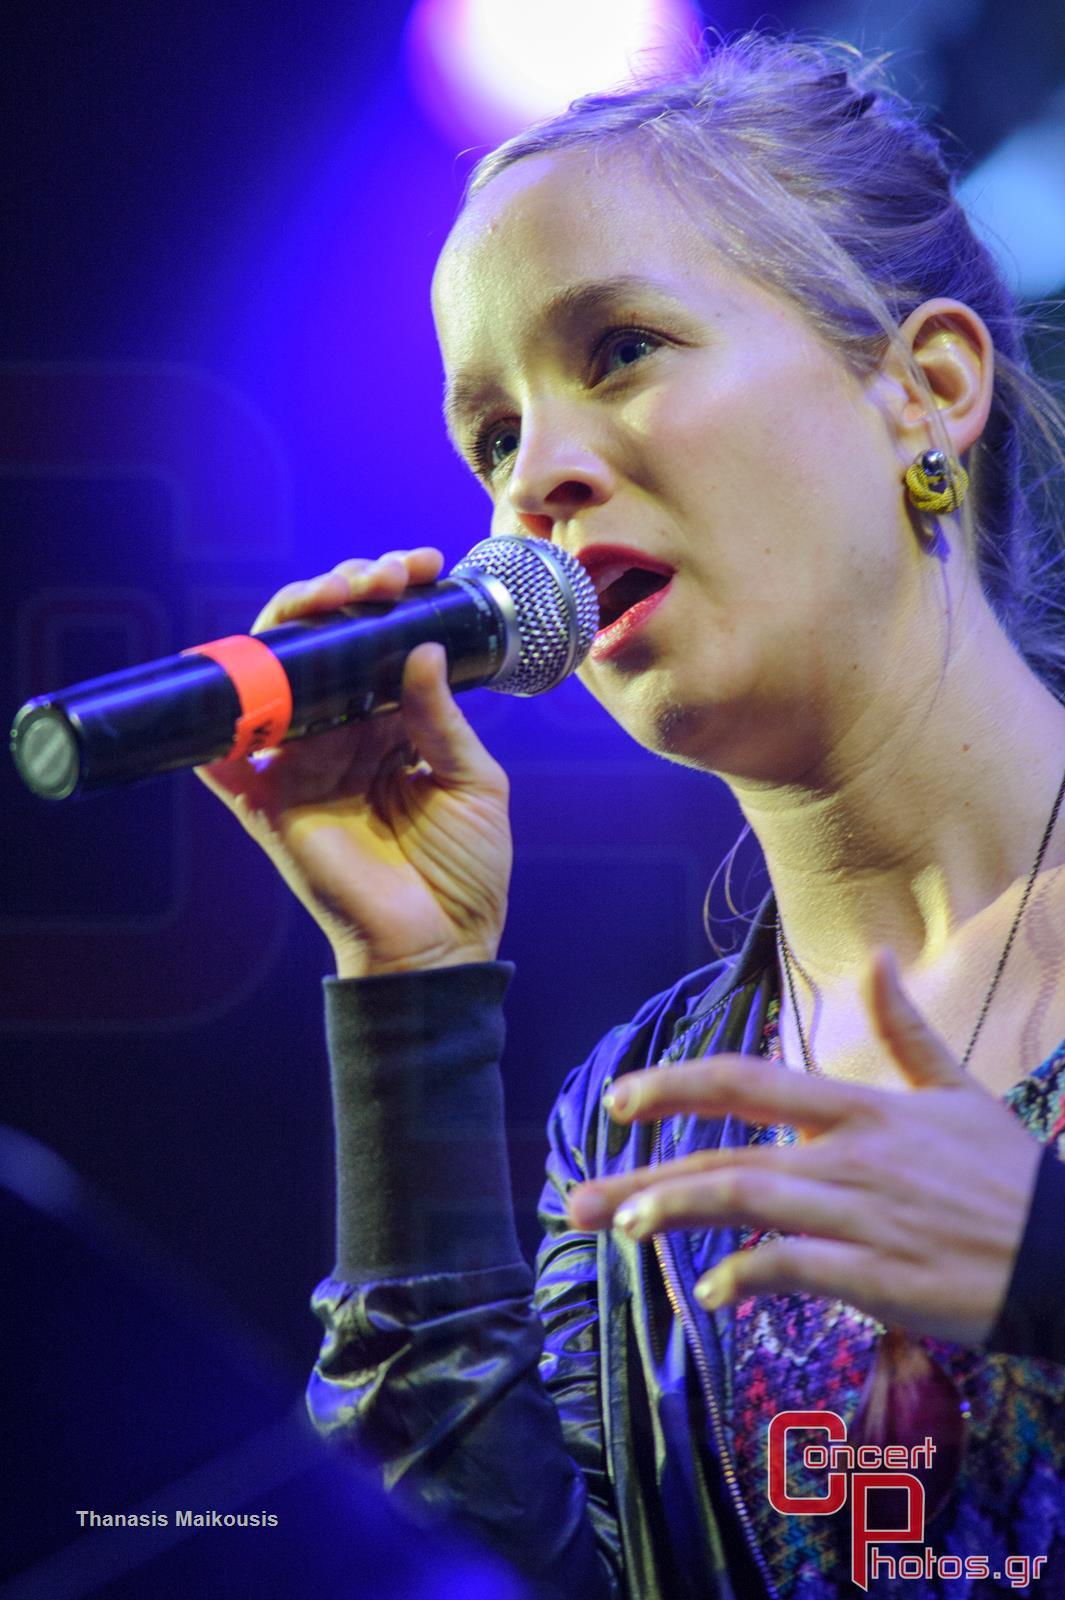 Active Member - Τραγούδα μας να φύγει το σκοτάδι- photographer: Thanasis Maikousis - concertphotos_-5759